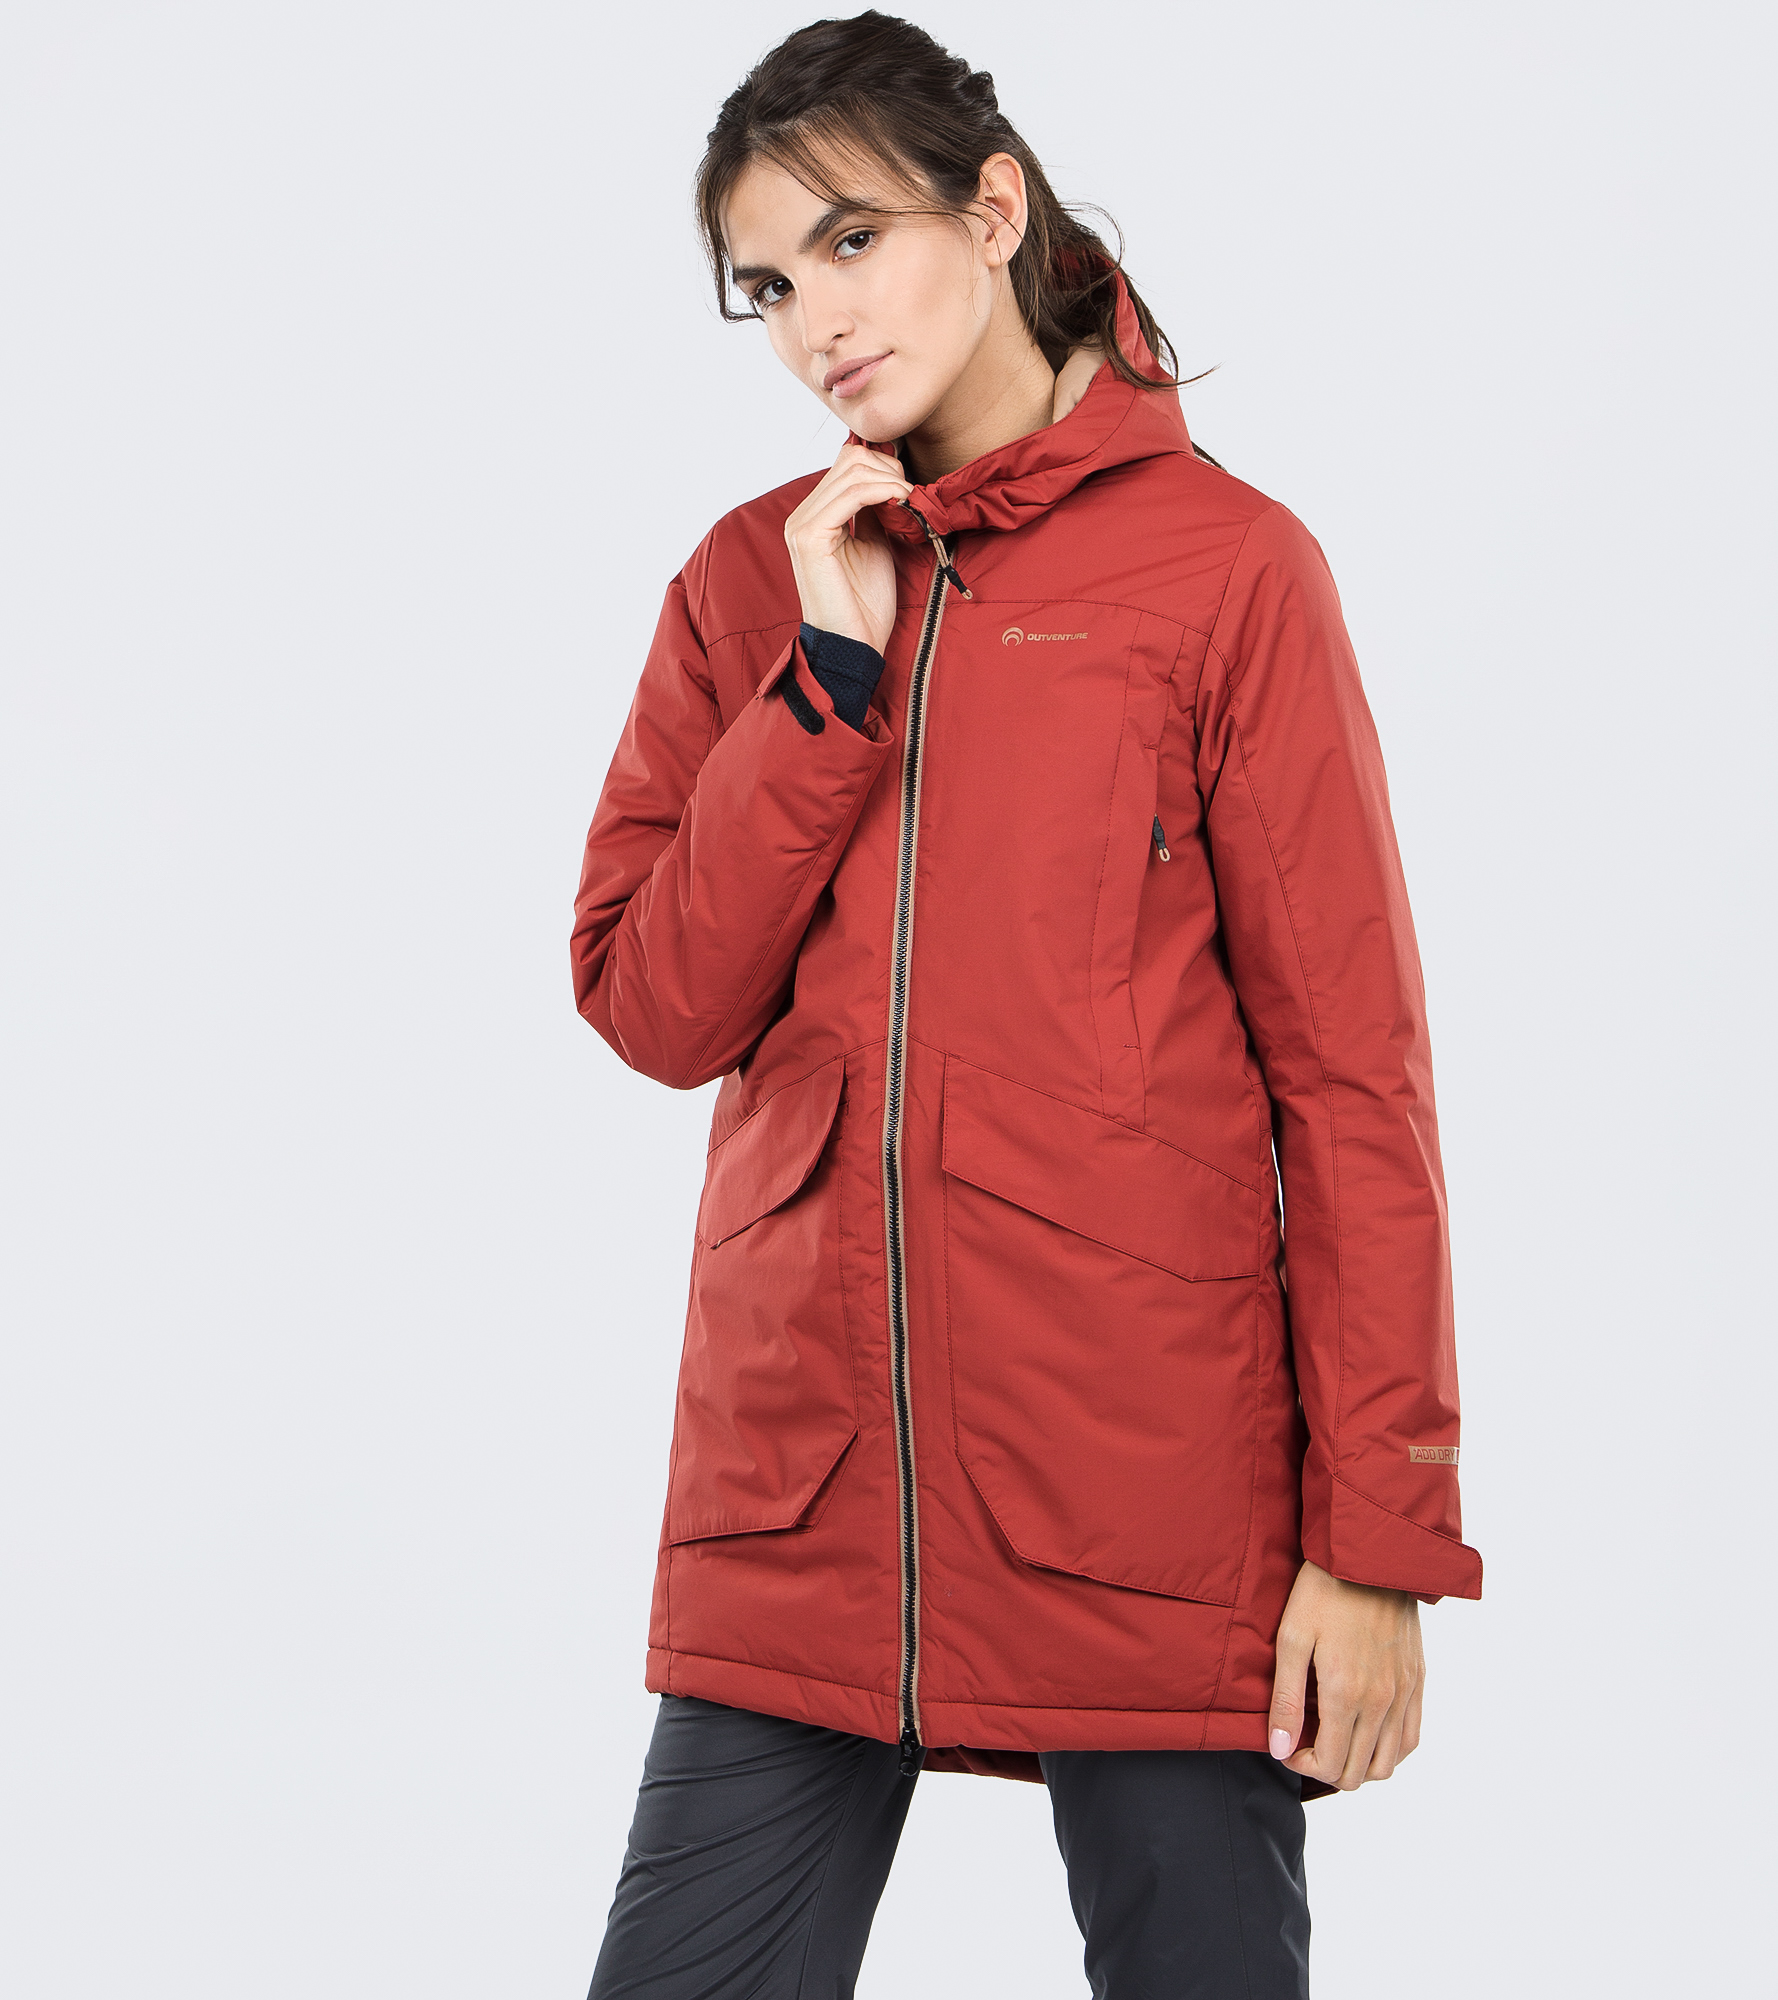 Outventure Куртка утепленная женская Outventure, размер 54 outventure рубашка женская outventure